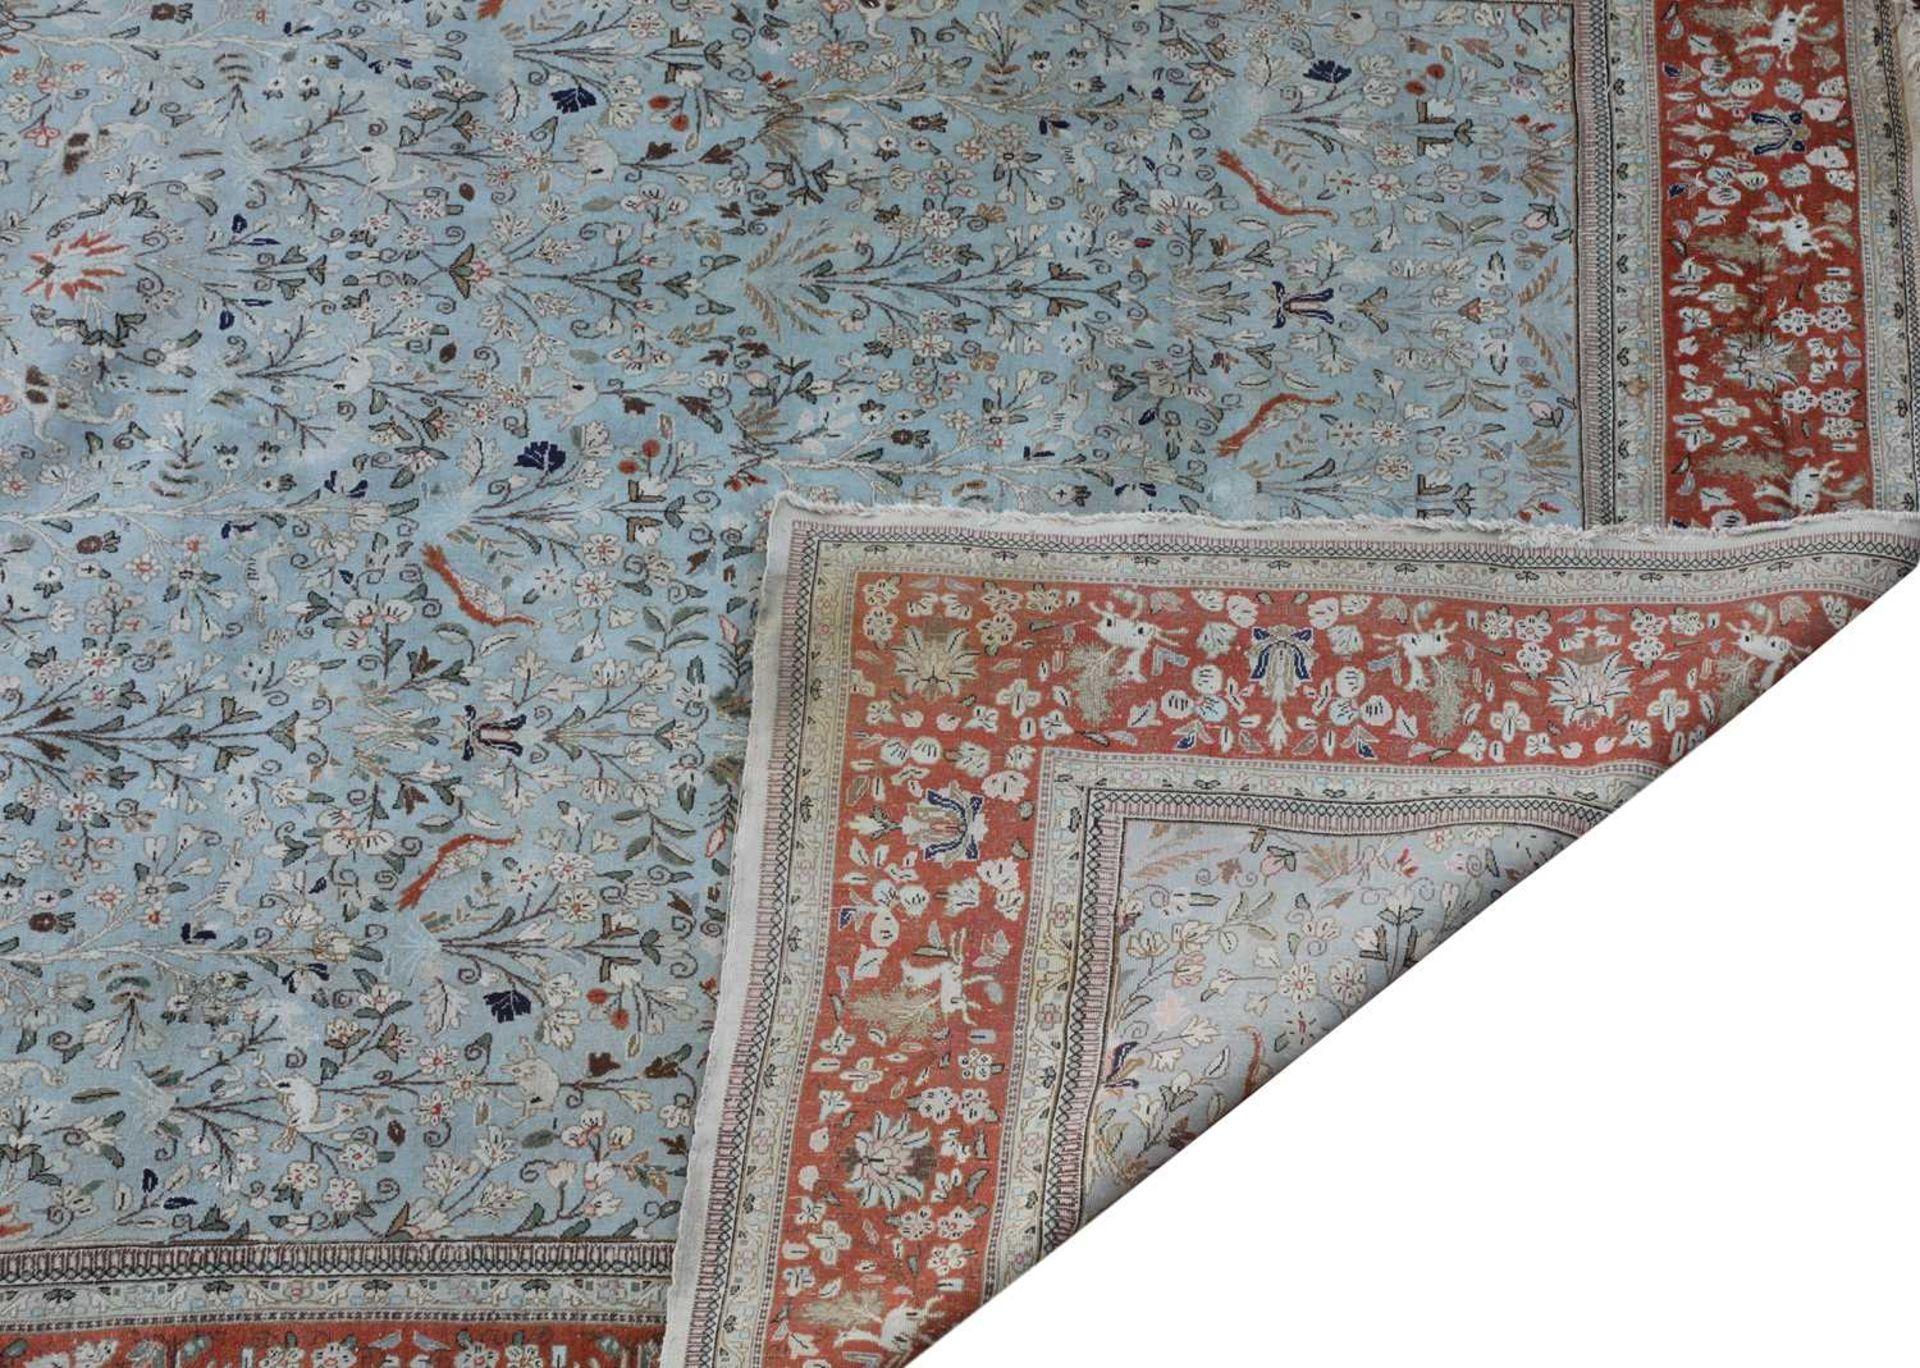 A large Persian carpet, - Image 2 of 2